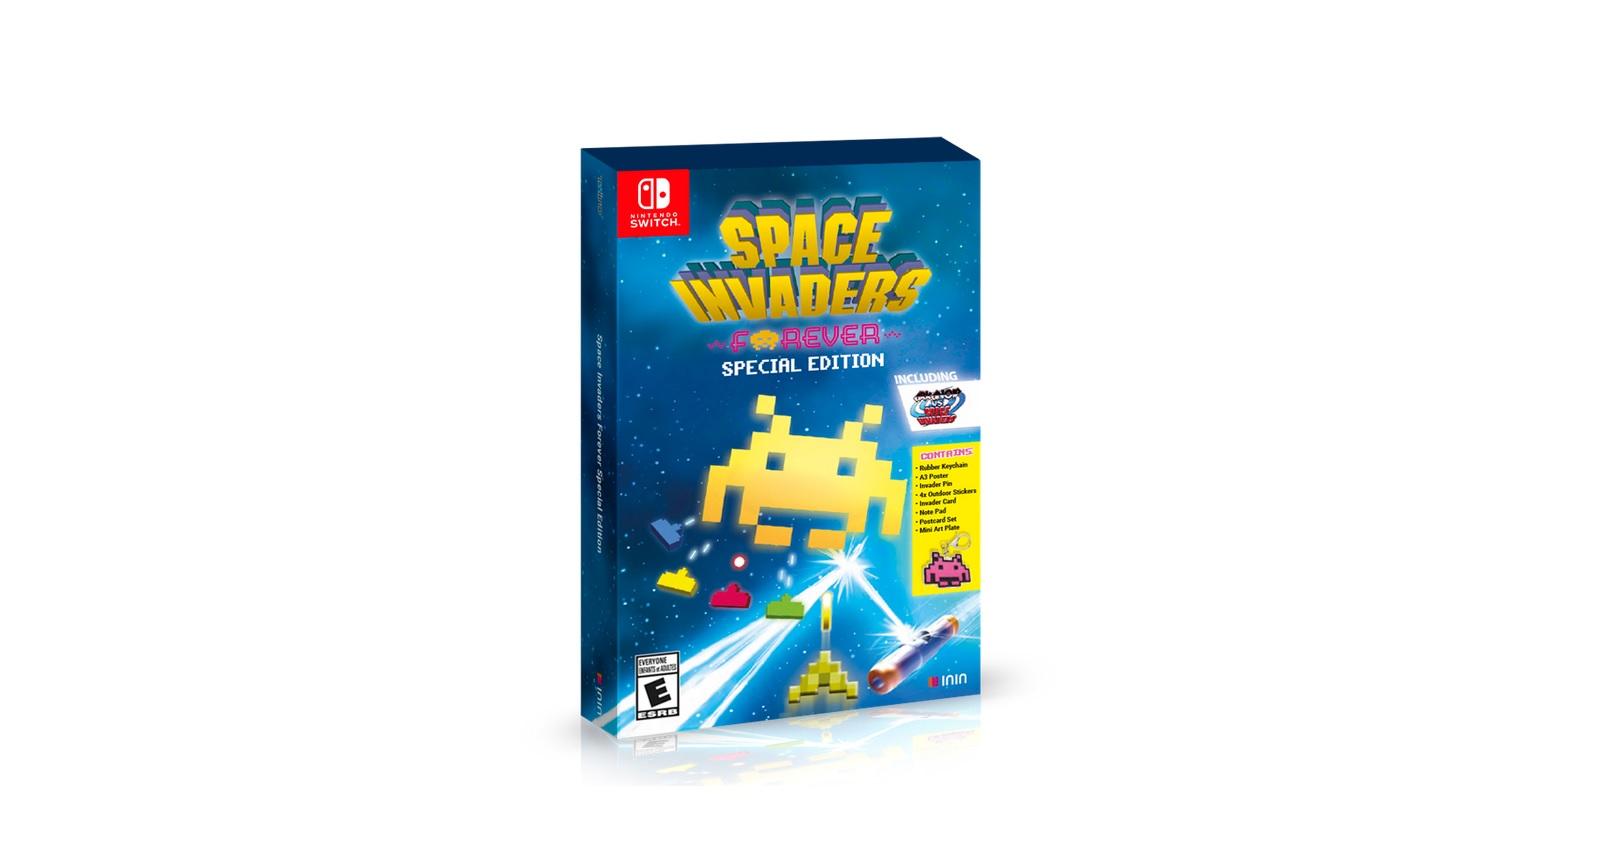 Space Invaders Forever edizione speciale per Nintendo Switch